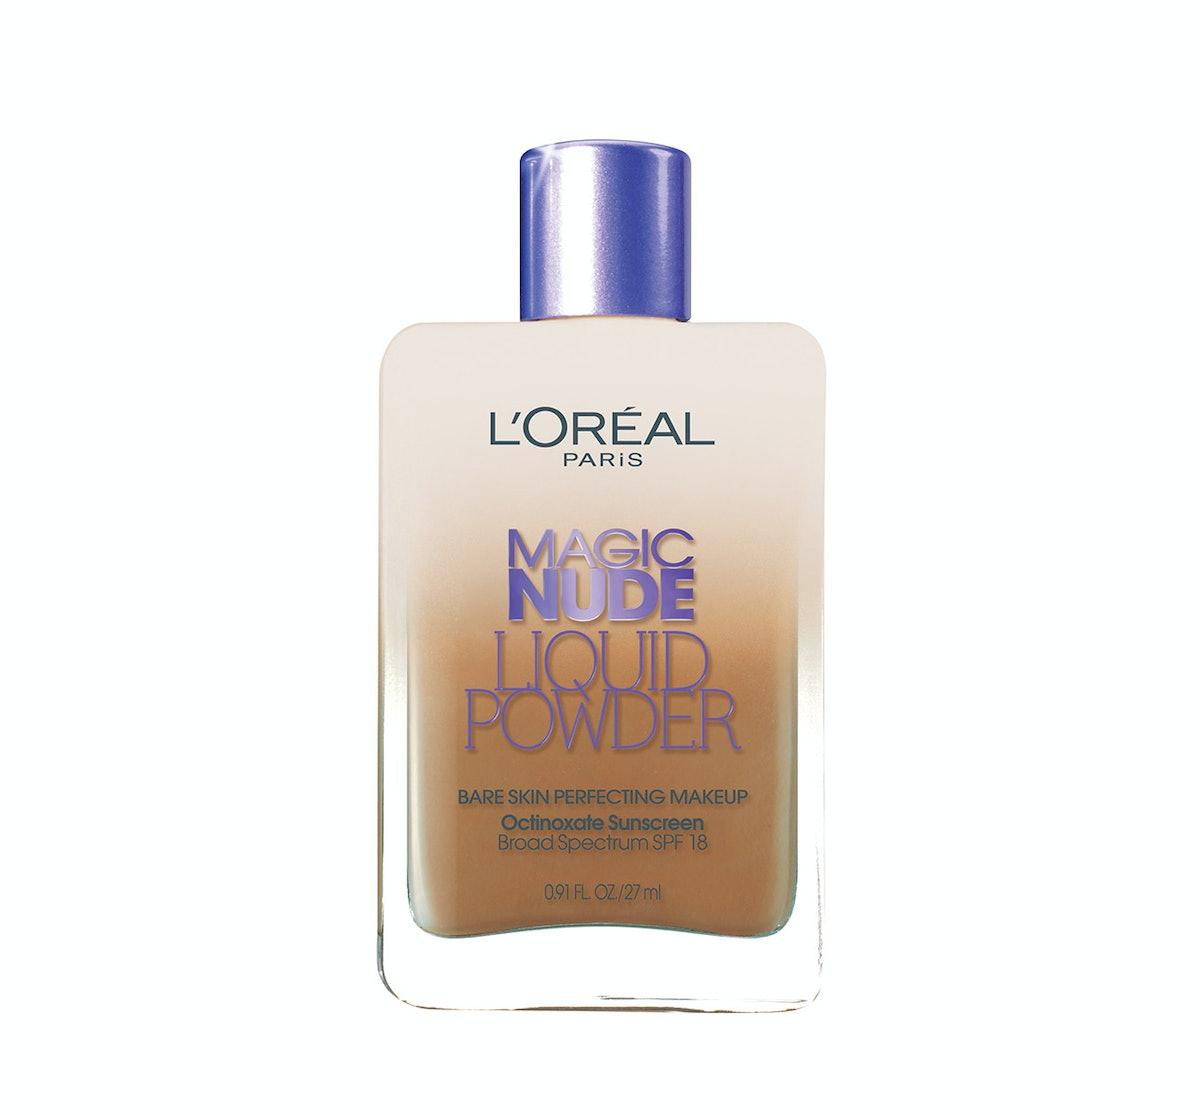 bear-jane-larkworthy-Magic-Nude-Liquid-Powder-in-Classic-Tan